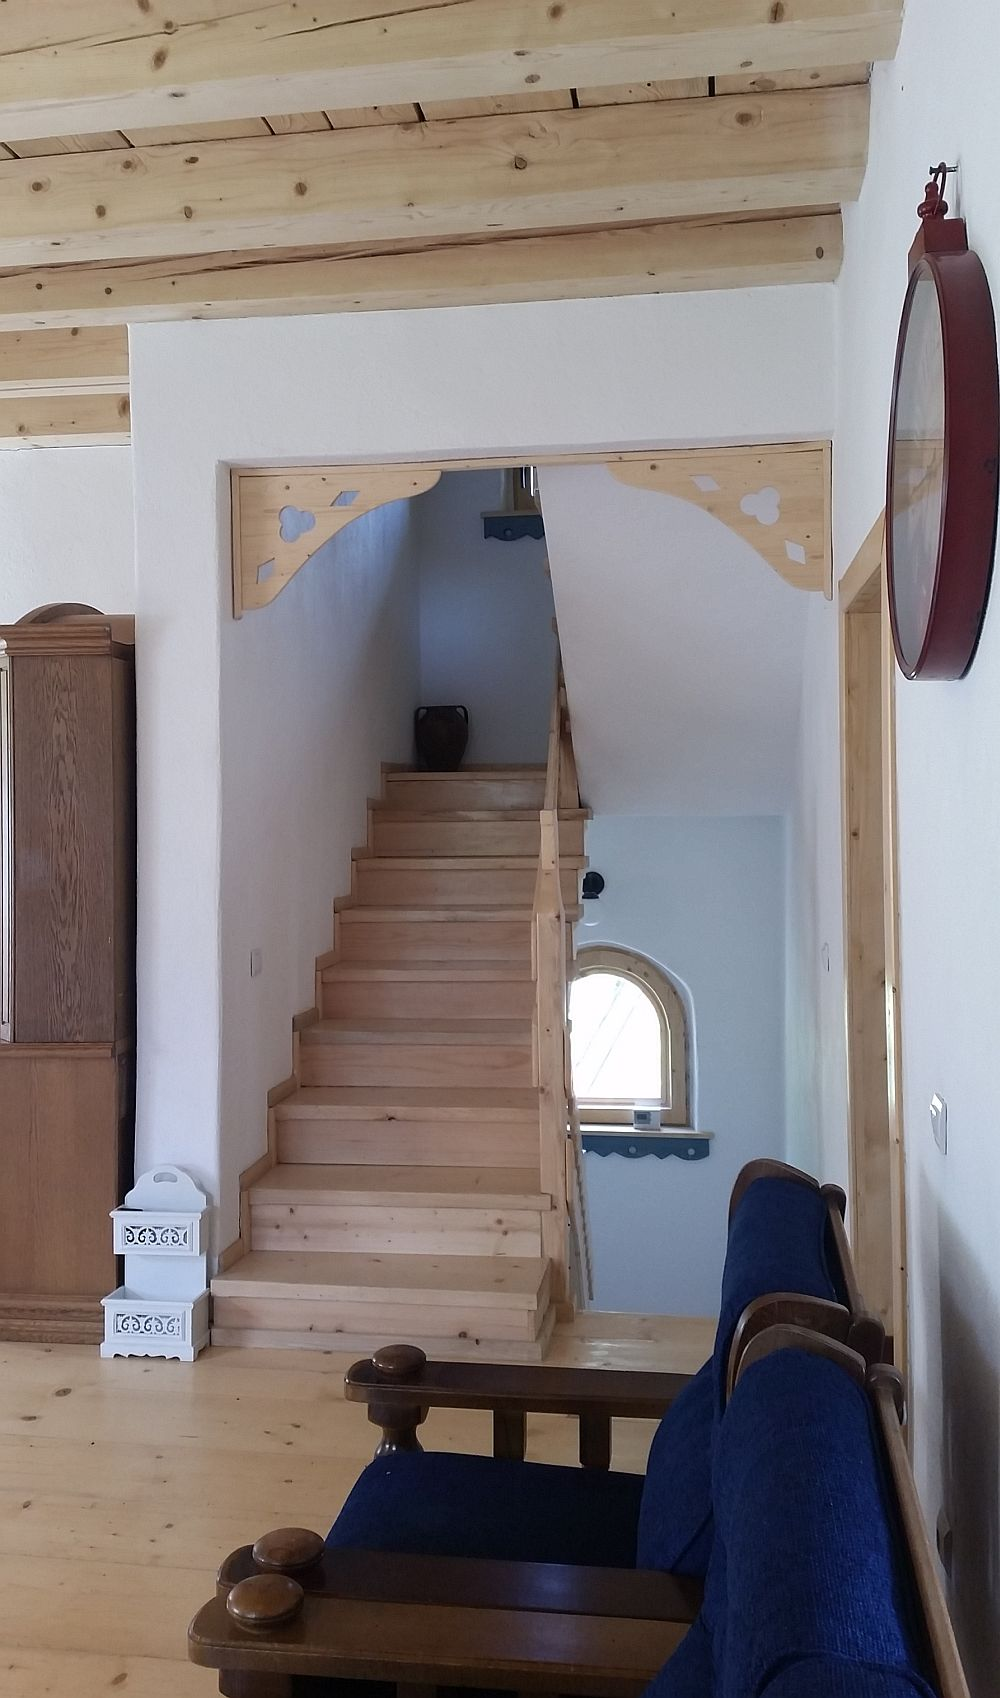 adelaparvu.com despre casa traditionala romaneasca reinterpretata, Foto Dragos Boldea (5)